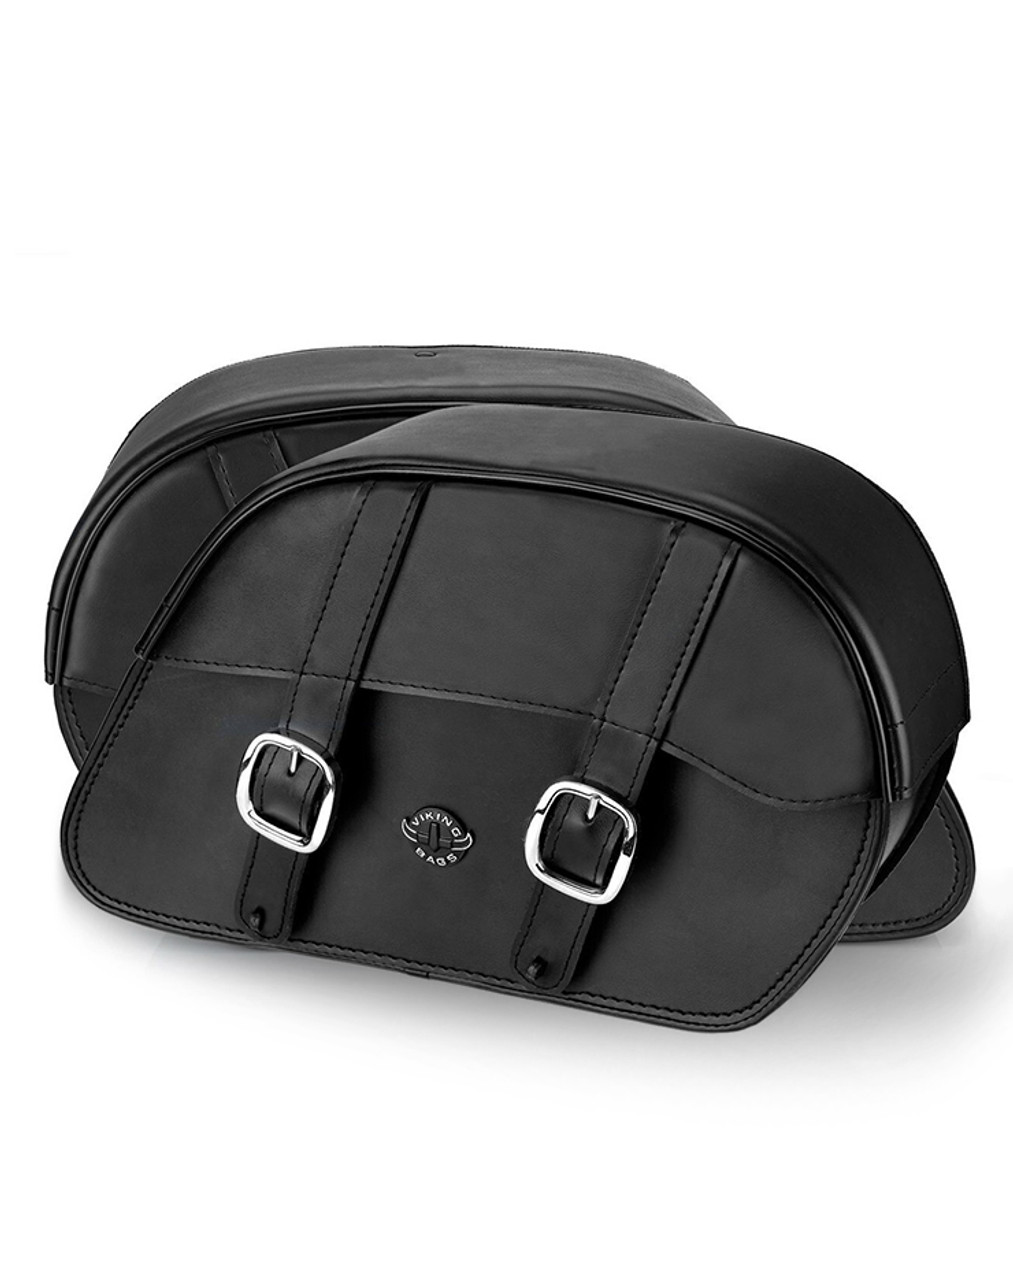 Honda VTX 1800 C Slanted Medium Motorcycle Saddlebags Both Bags View